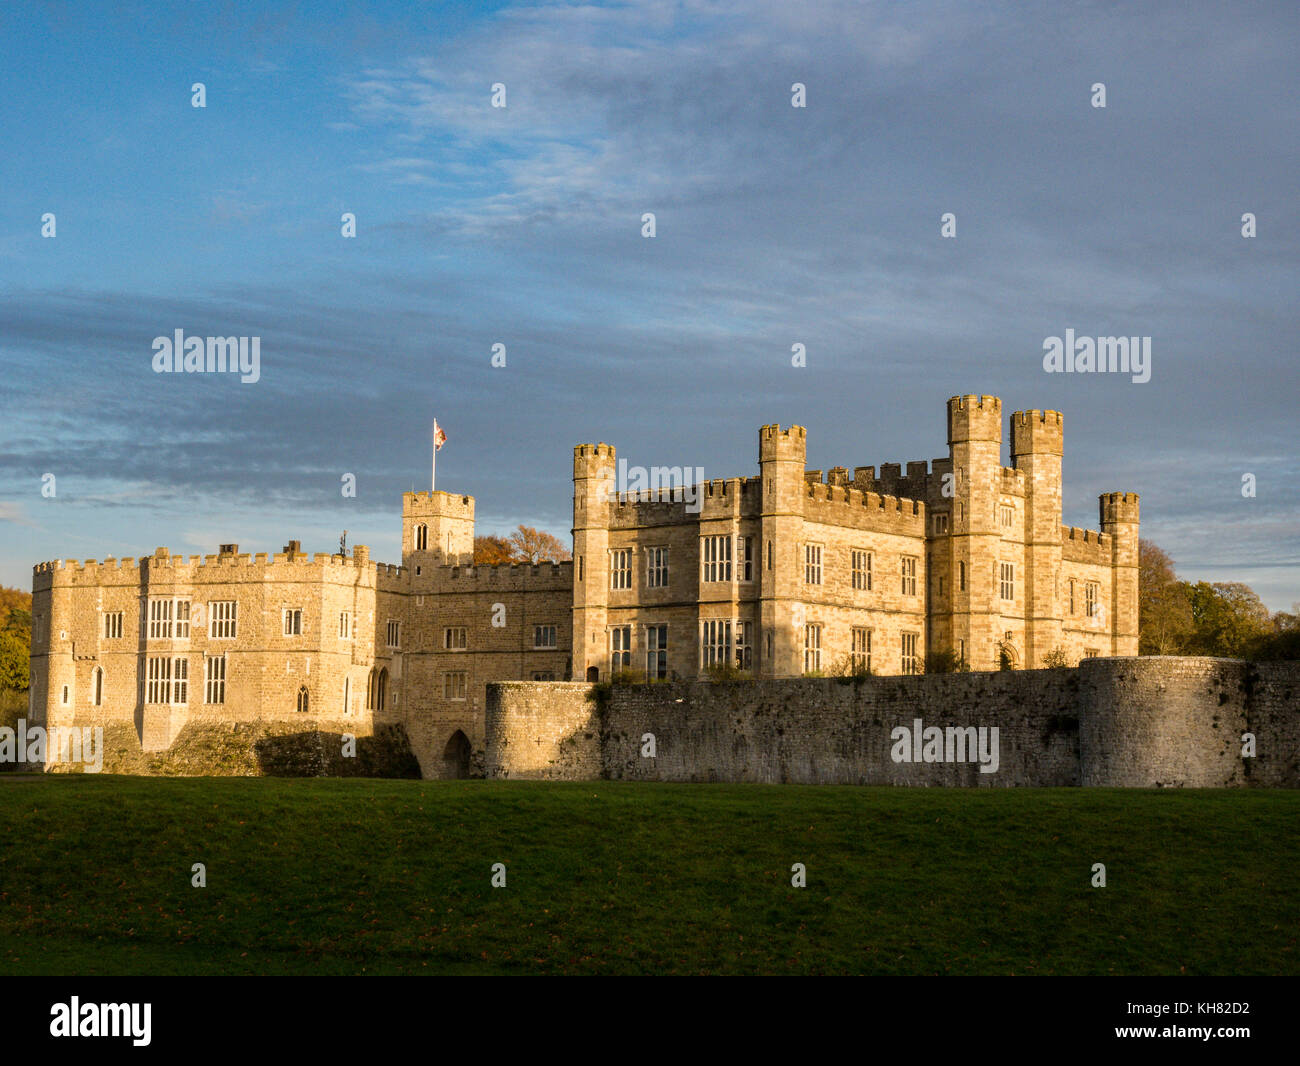 Leeds castle, Maidstone, Kent, UK - Stock Image